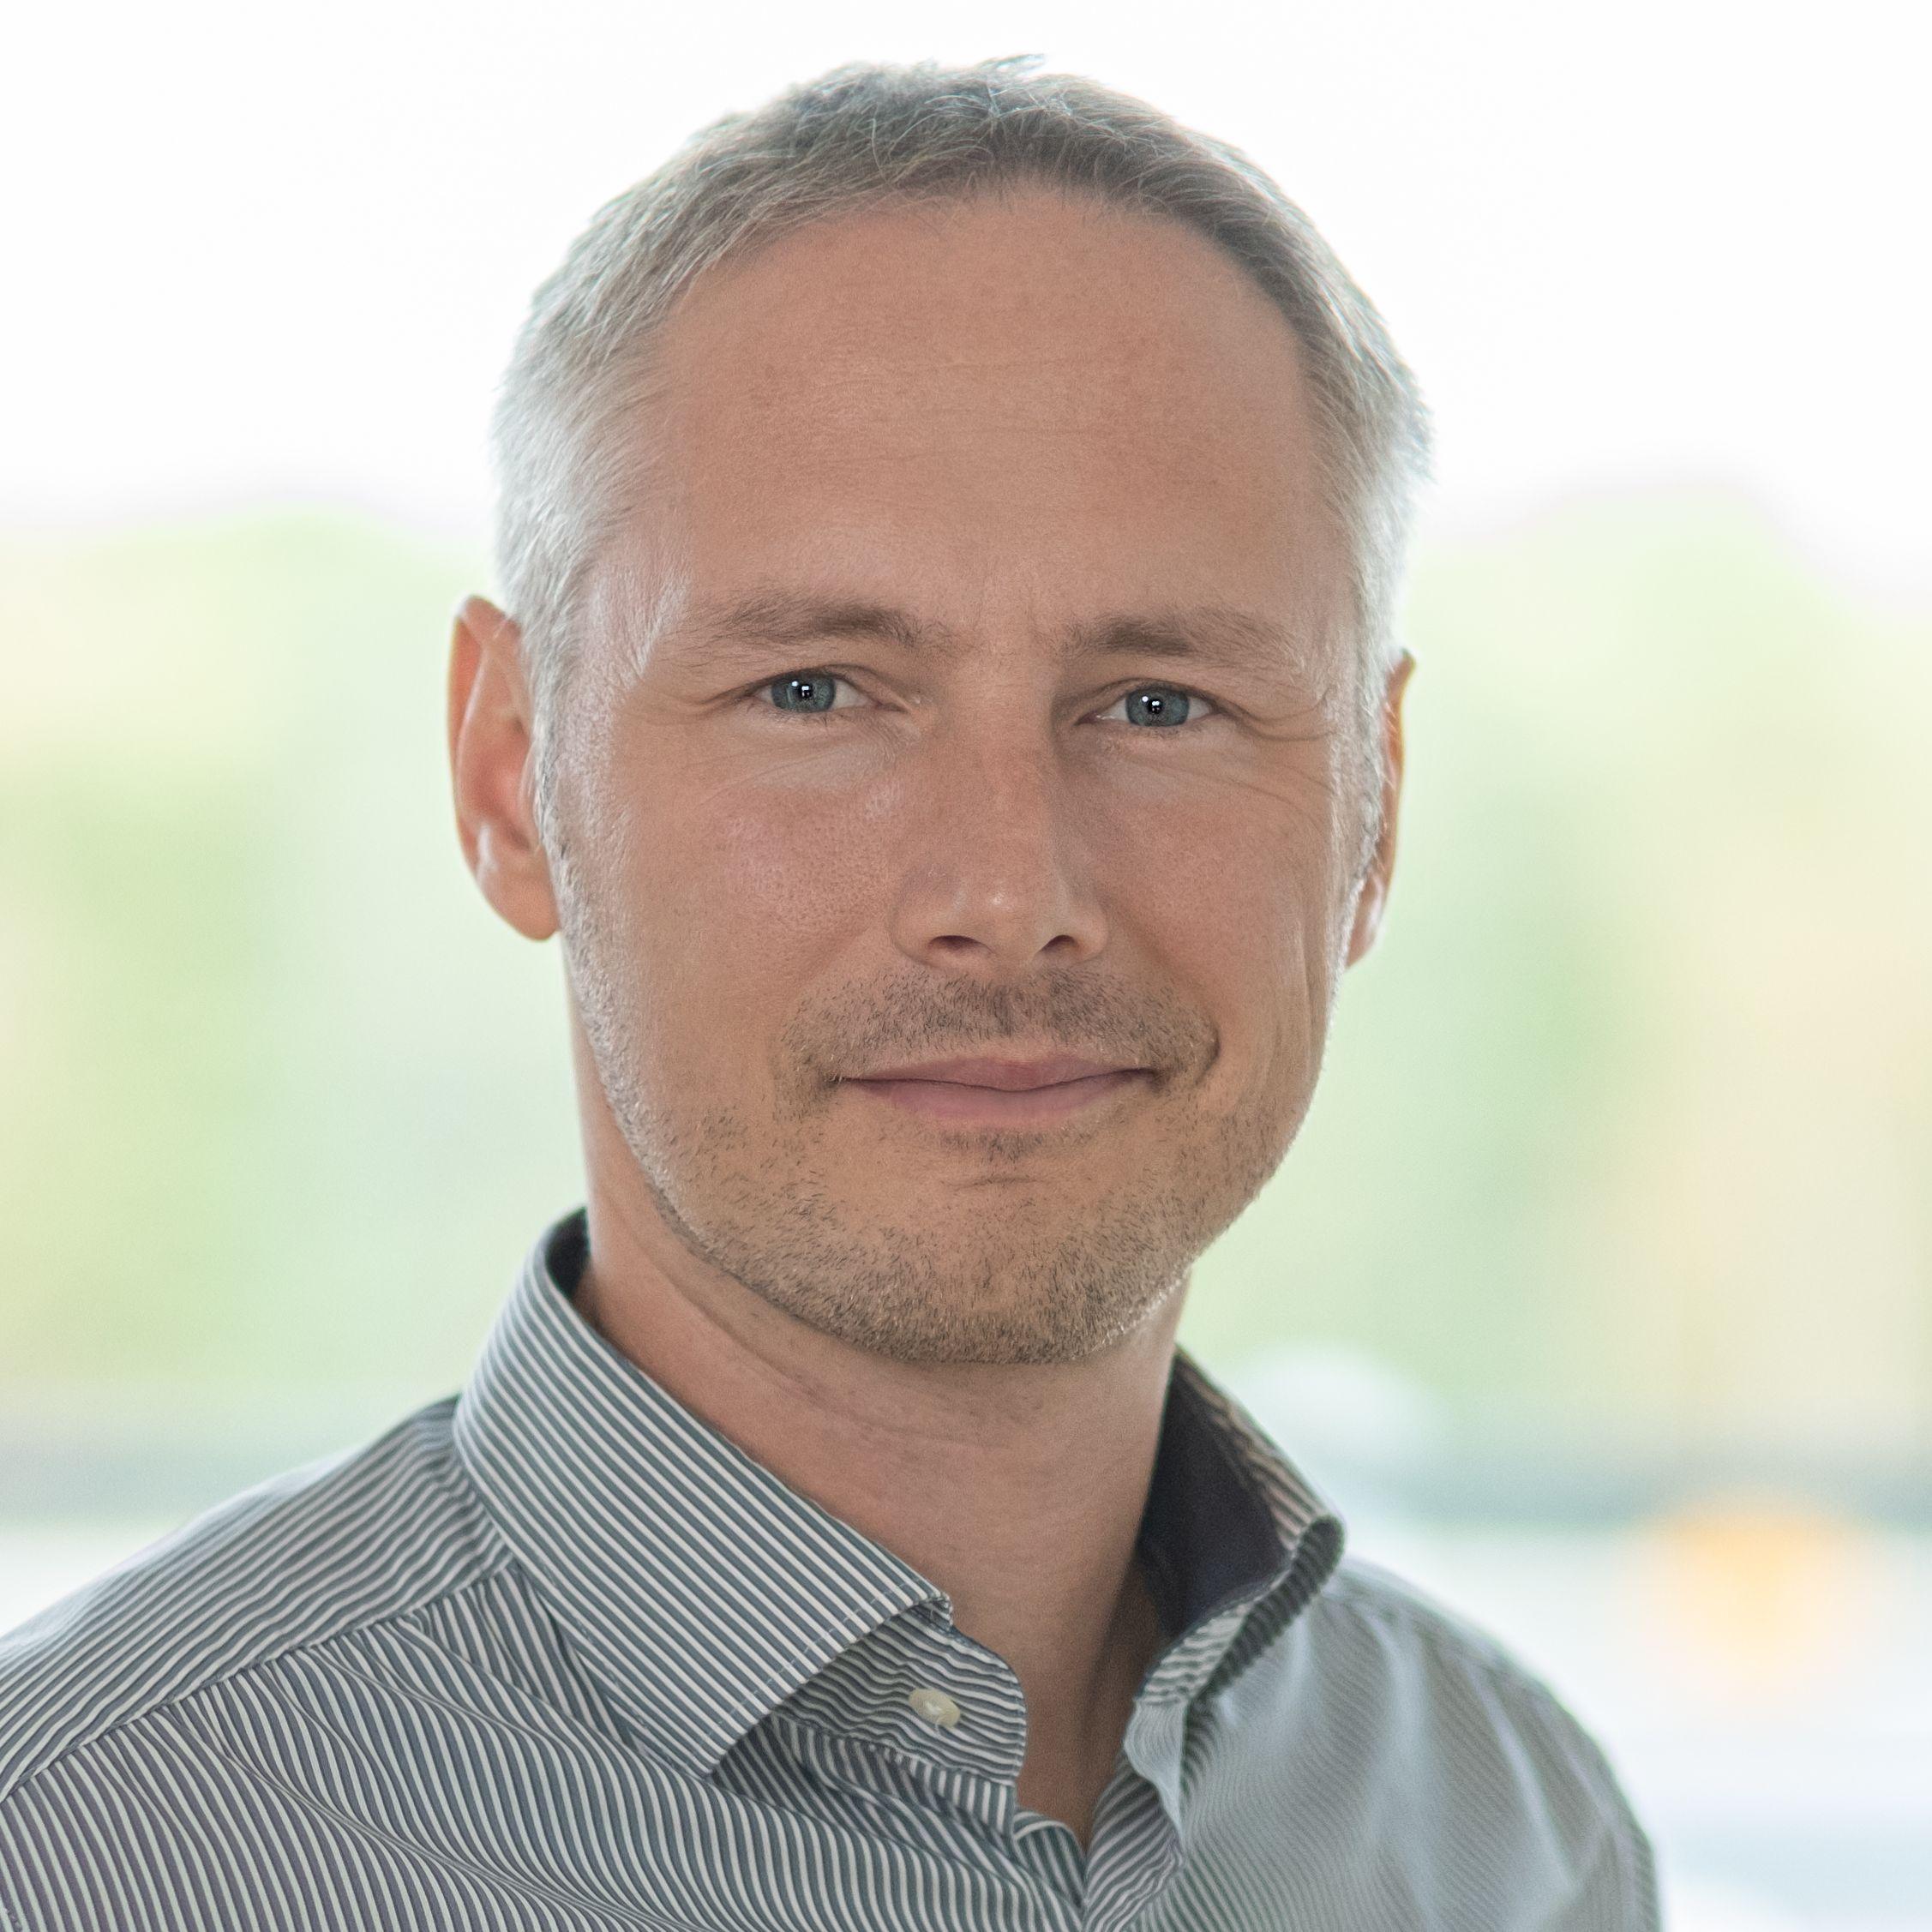 Marcus Pietzsch, Fraunhofer Institute IPMS